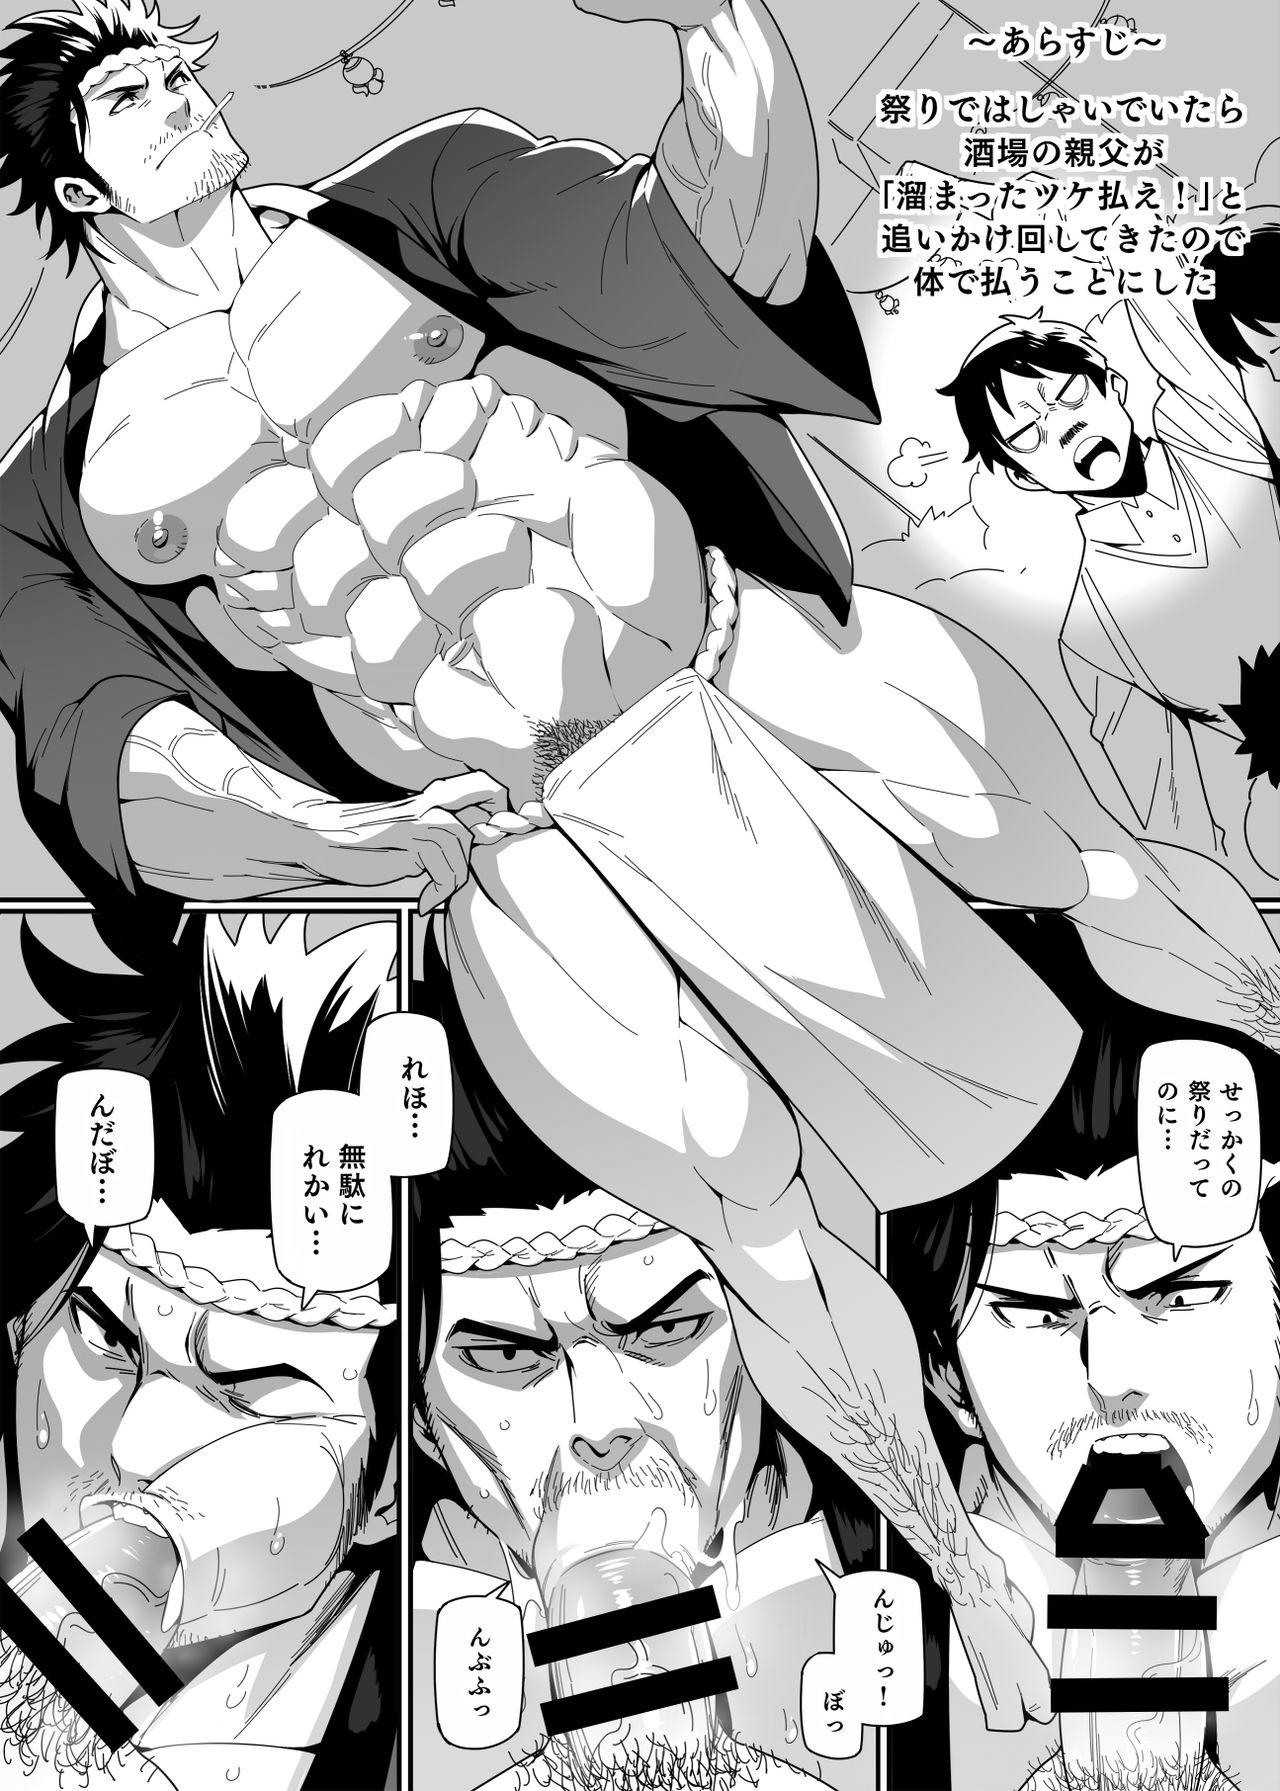 Гей Порно Комикс С Ями Сукехиро